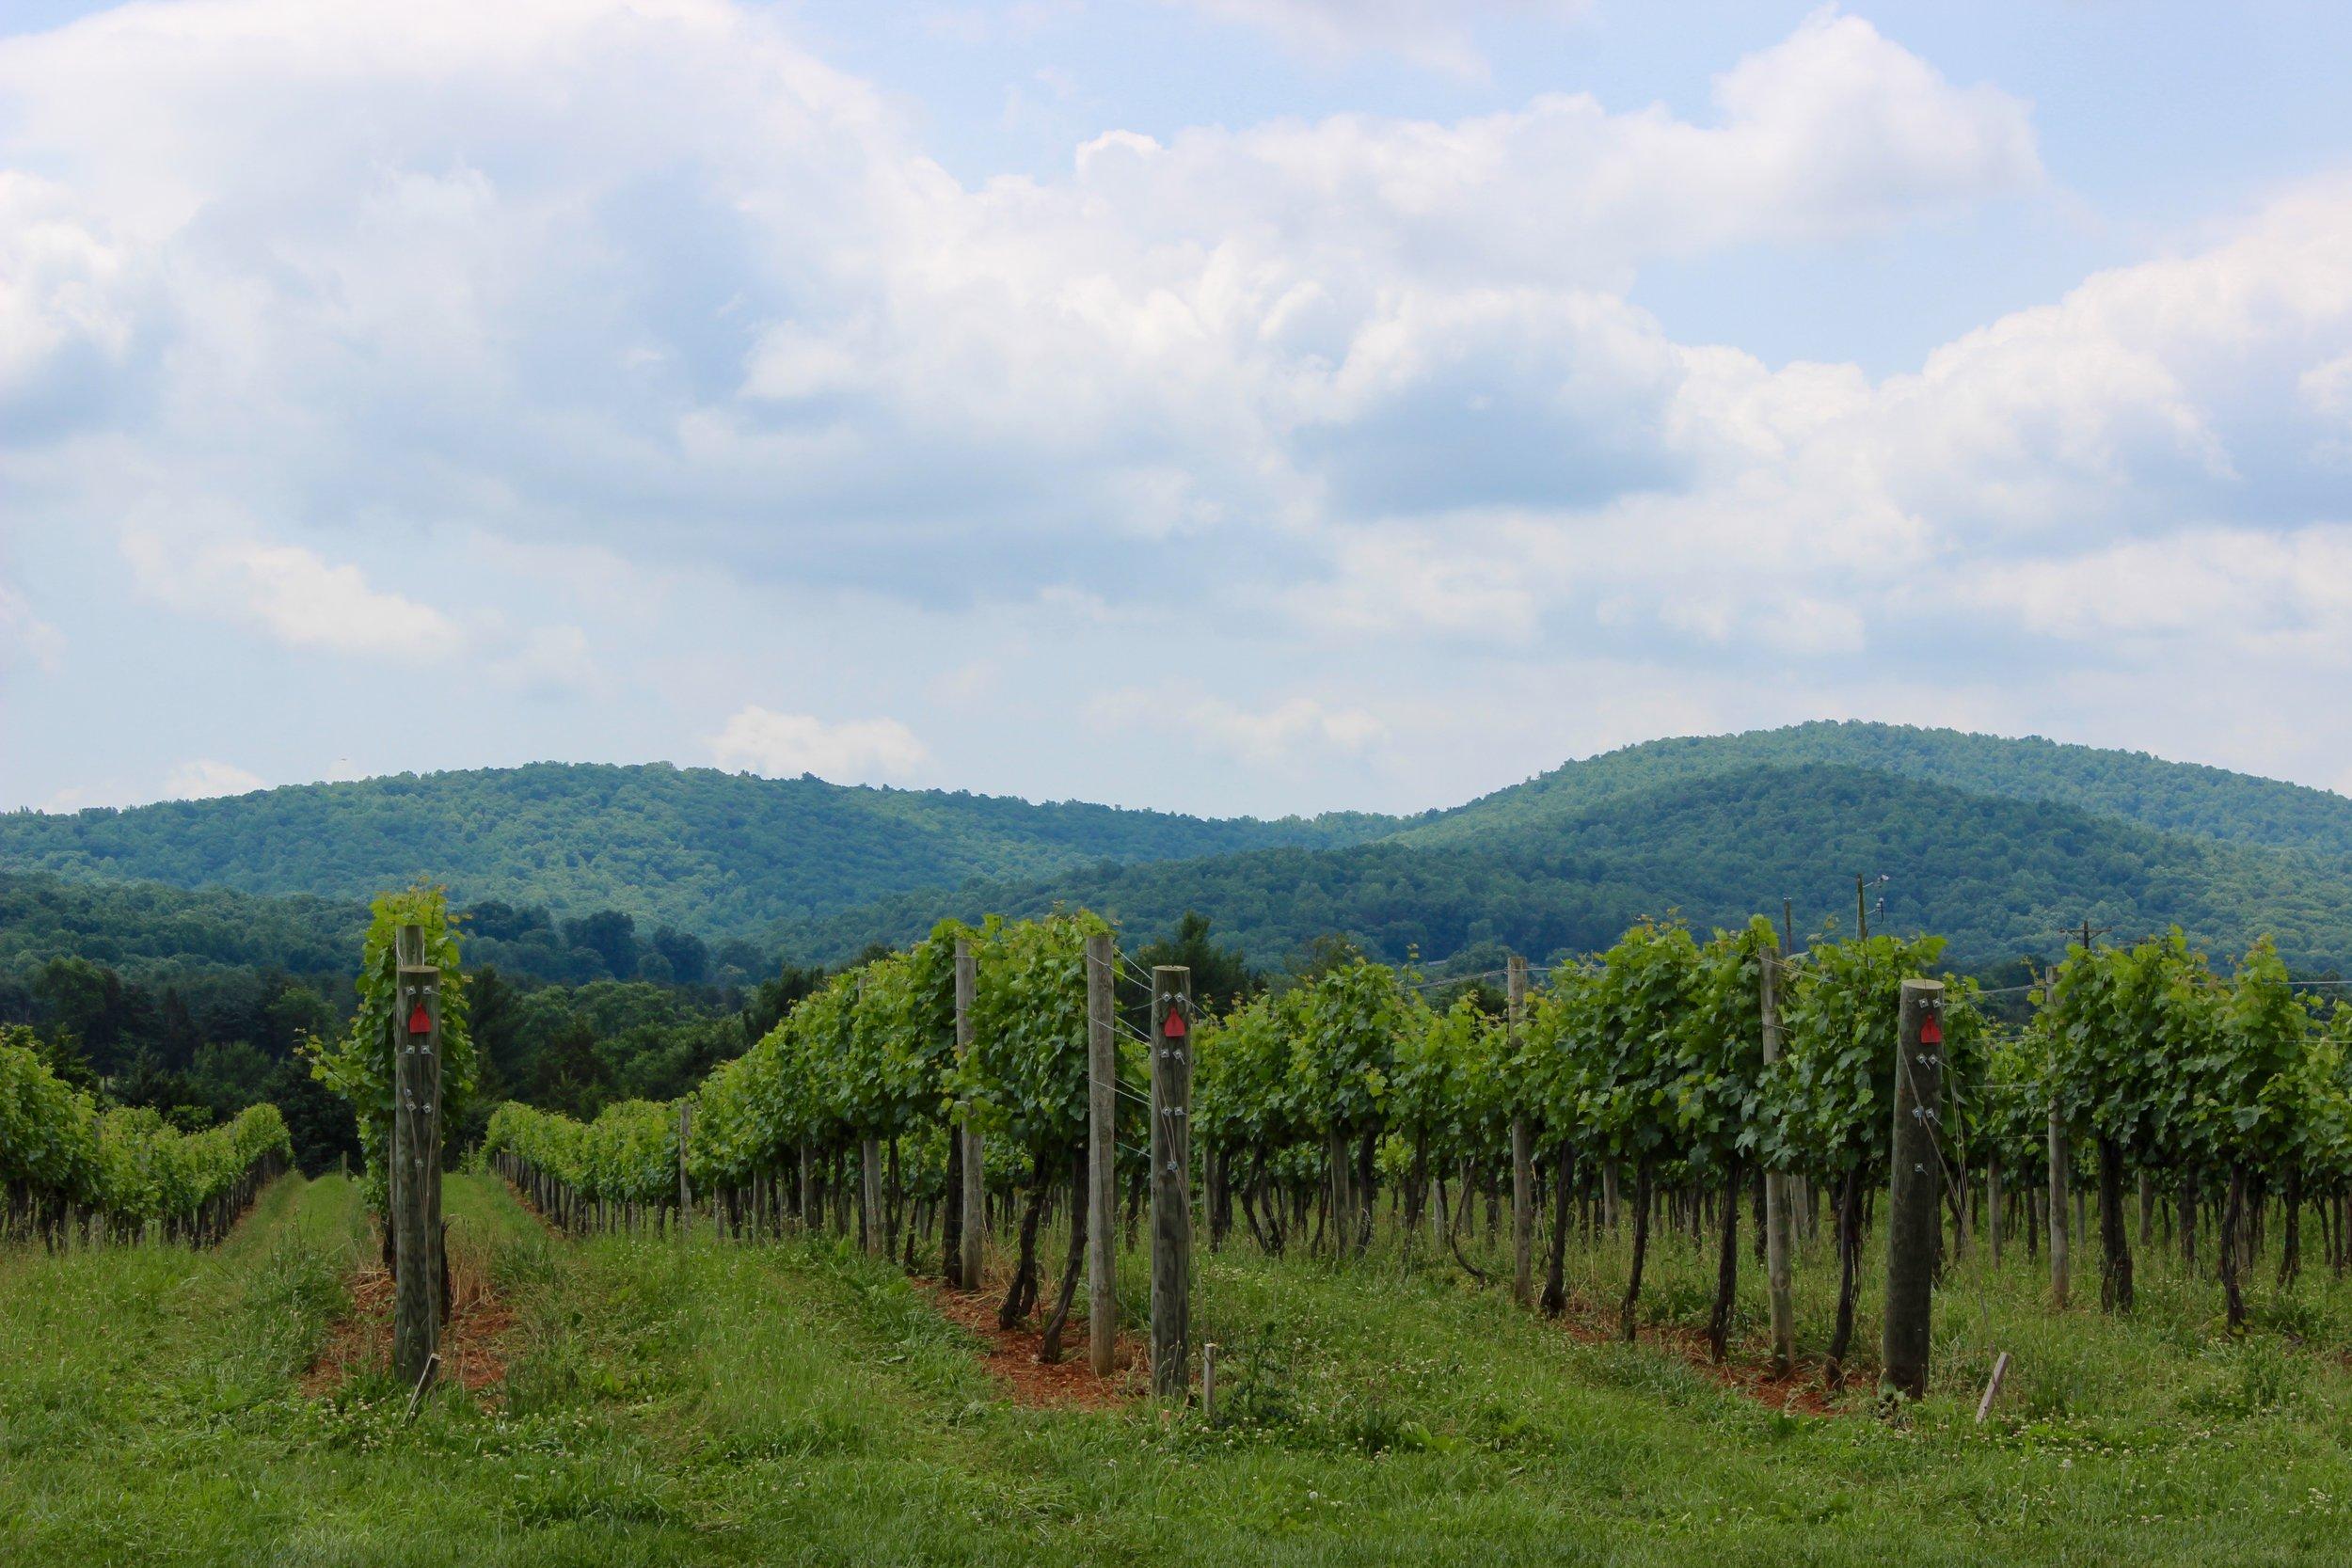 Chestnut Oak Vineyard